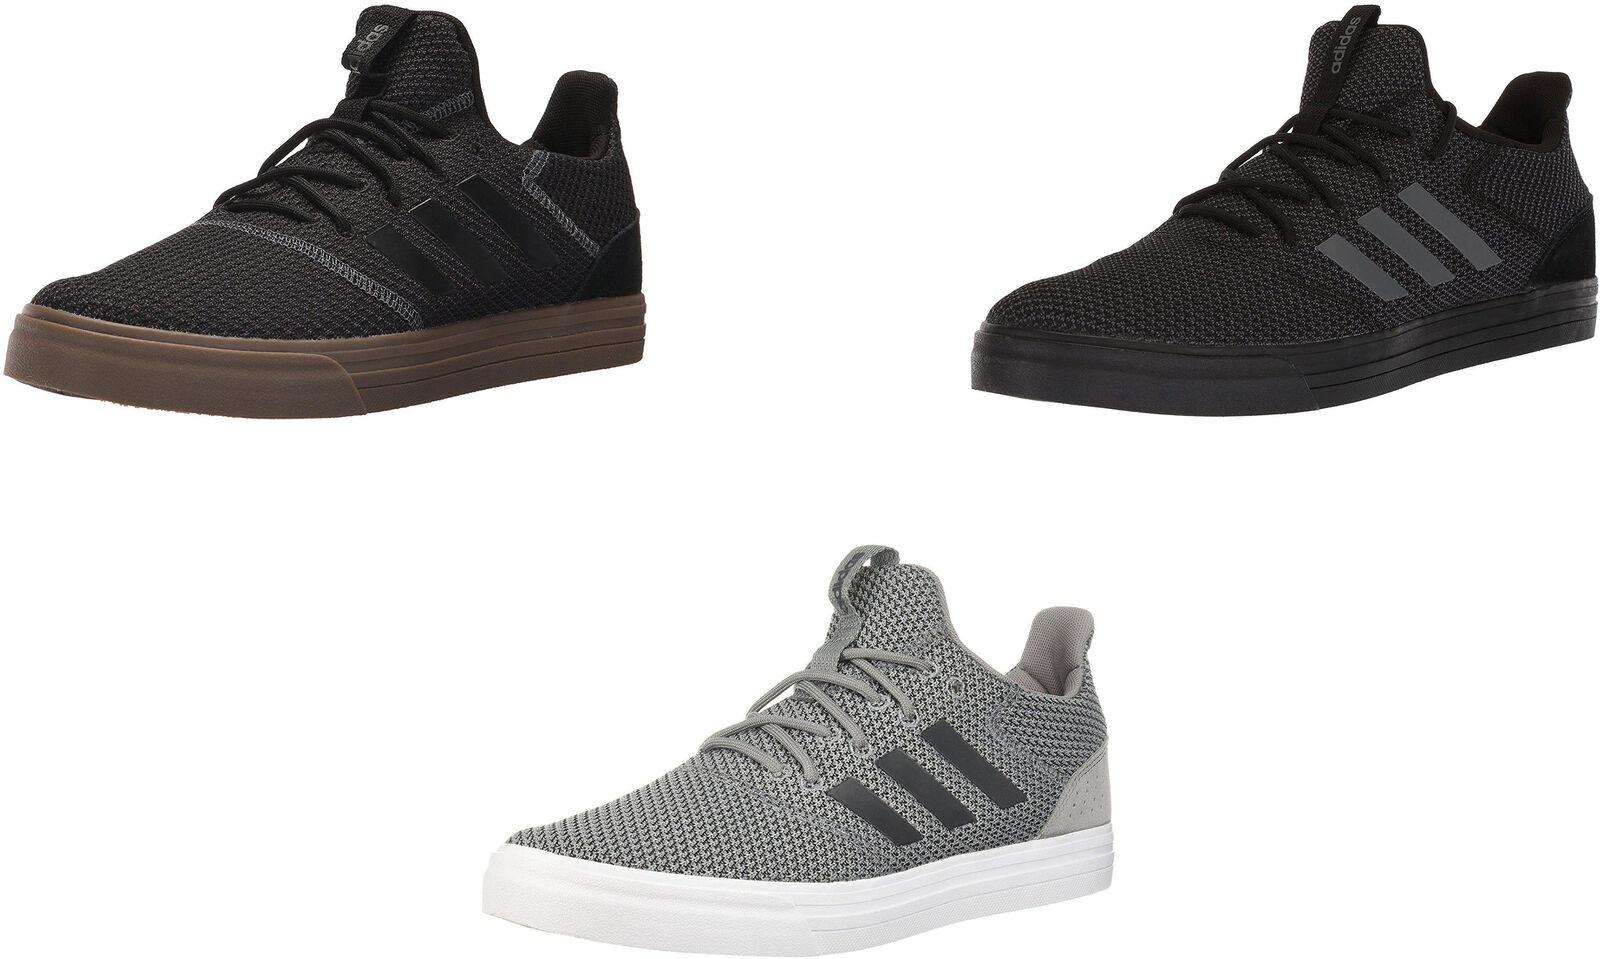 adidas Men's Stealth Shoes, 3 Colors